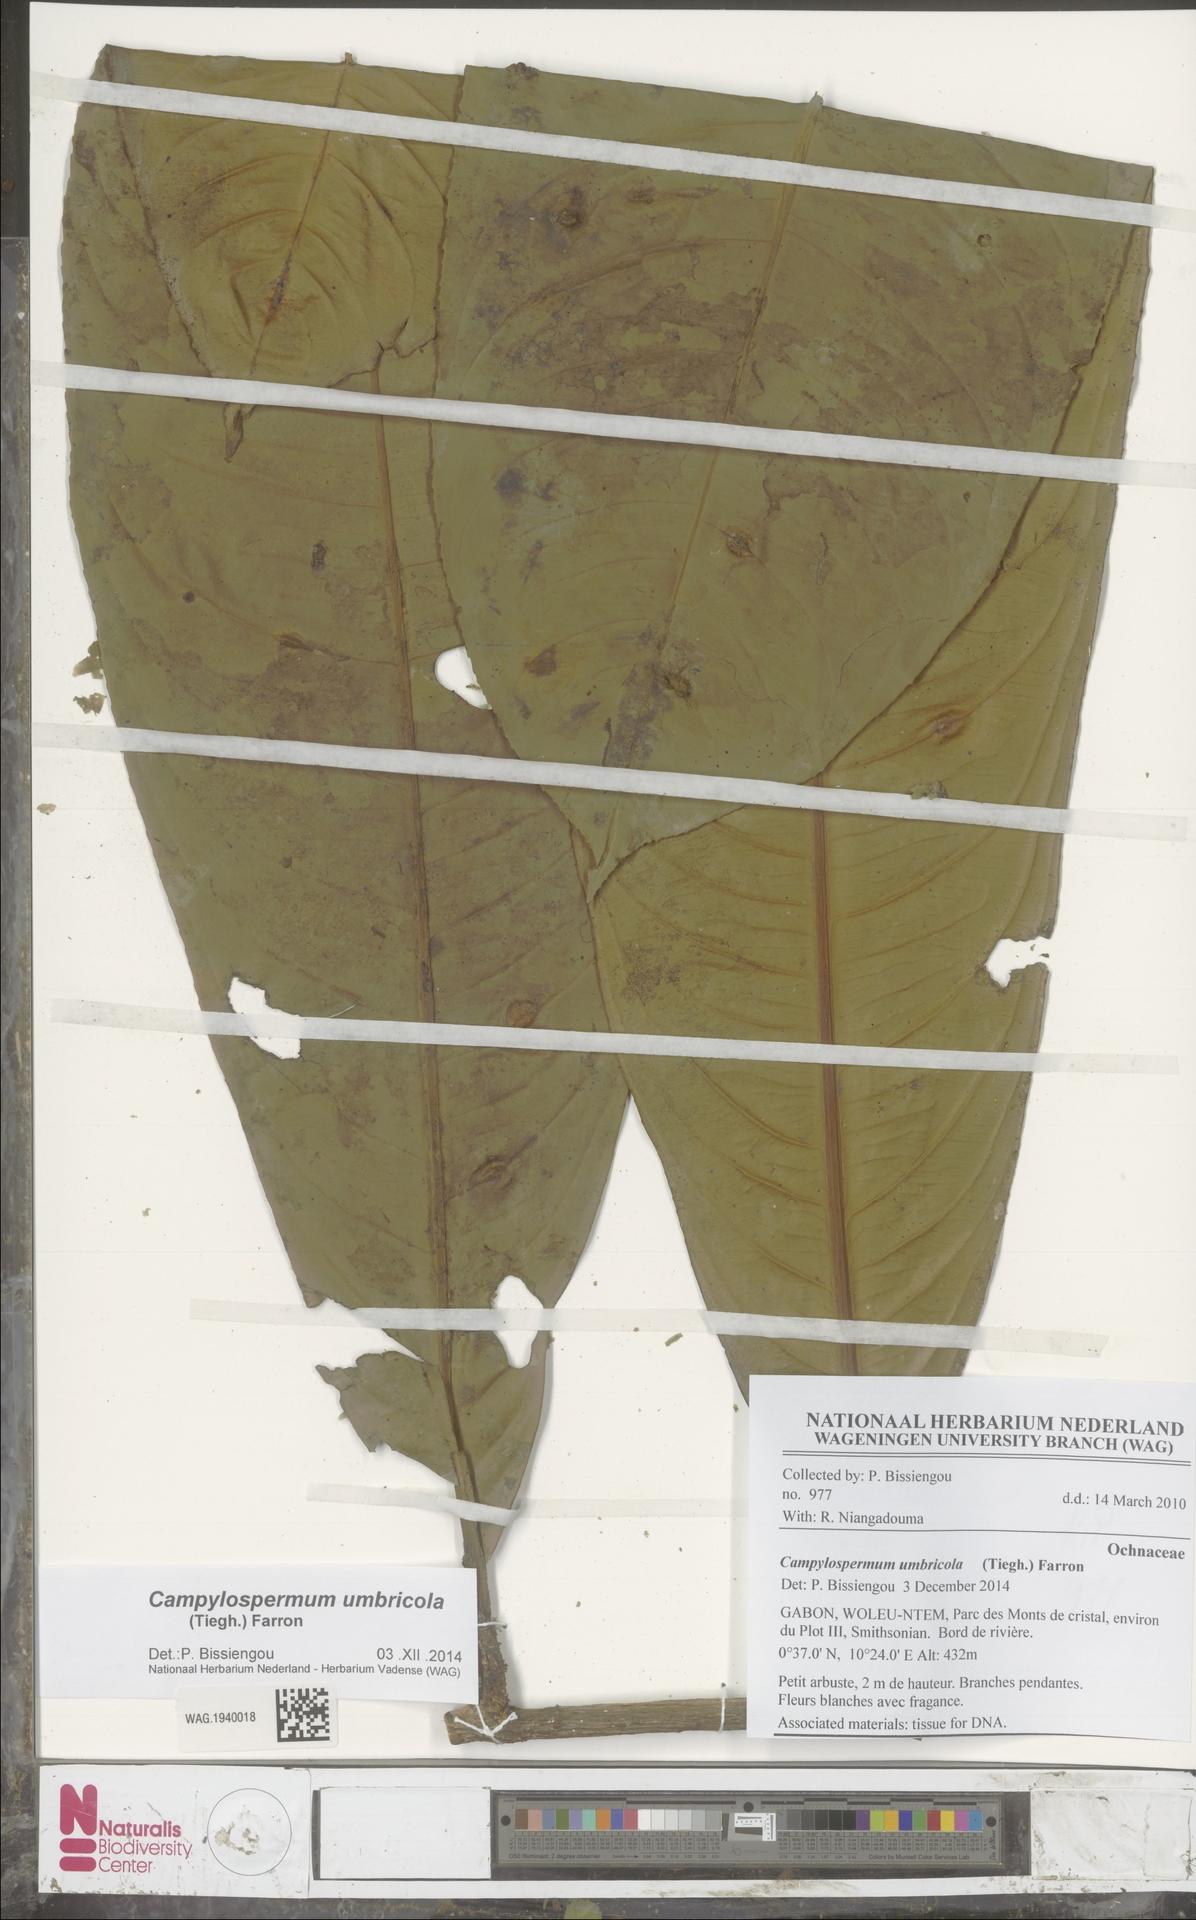 WAG.1940018 | Campylospermum umbricola (Tiegh.) Farron